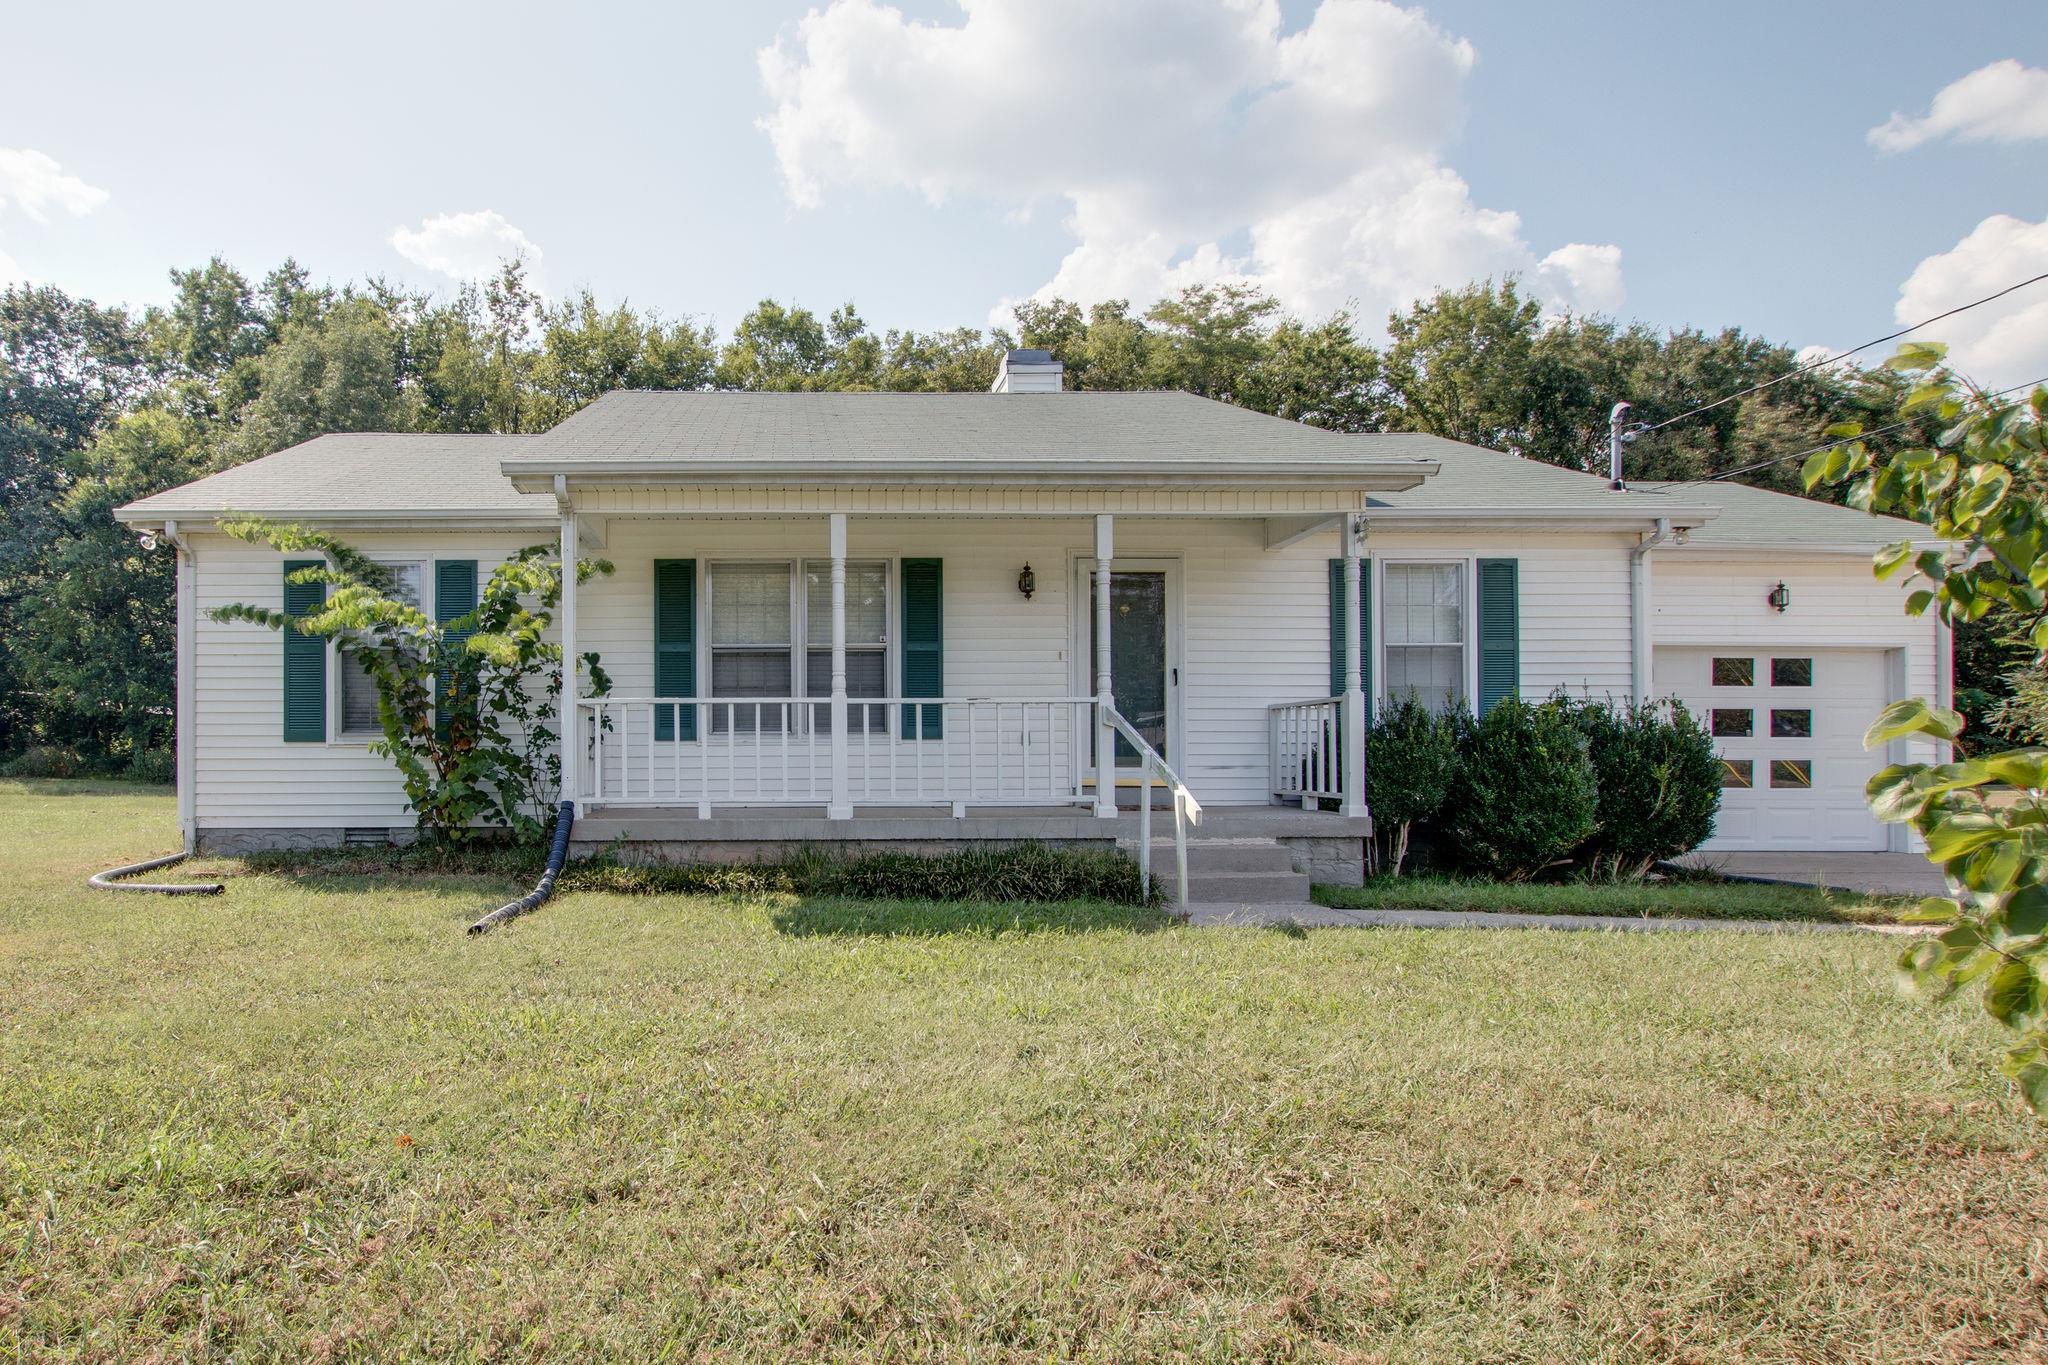 2408 Canterbury Chase, Murfreesboro, TN 37128 - Murfreesboro, TN real estate listing